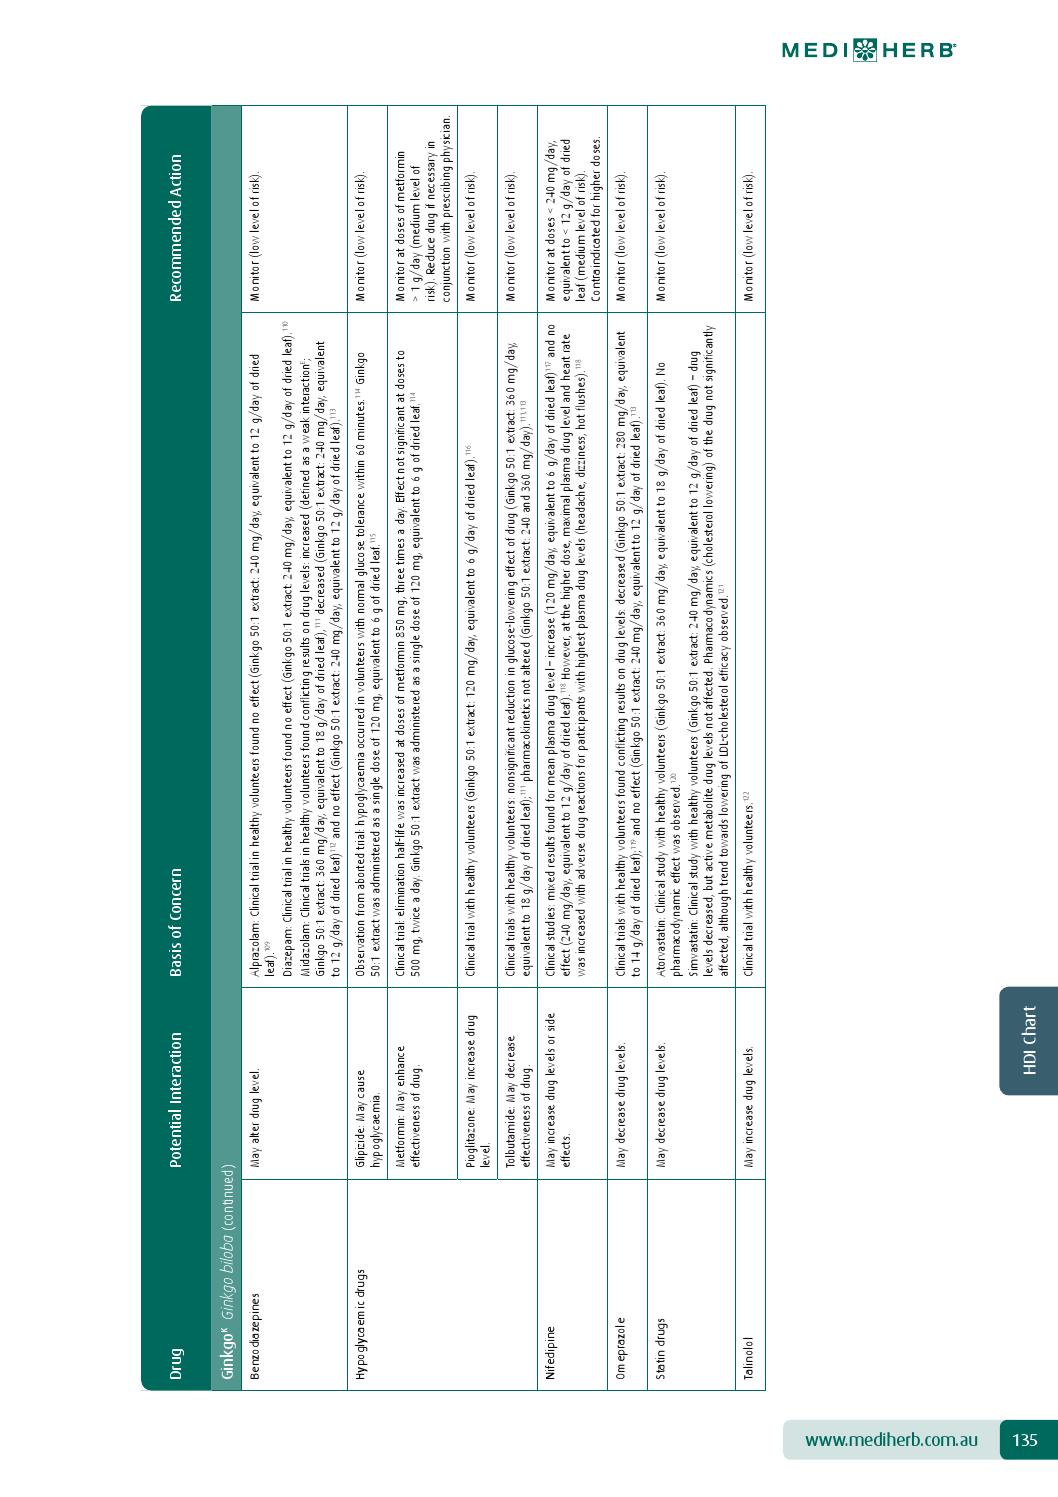 MediHerb Liquid Prescriber's Guide 2015 Australia by Integria Healthcare -  issuu